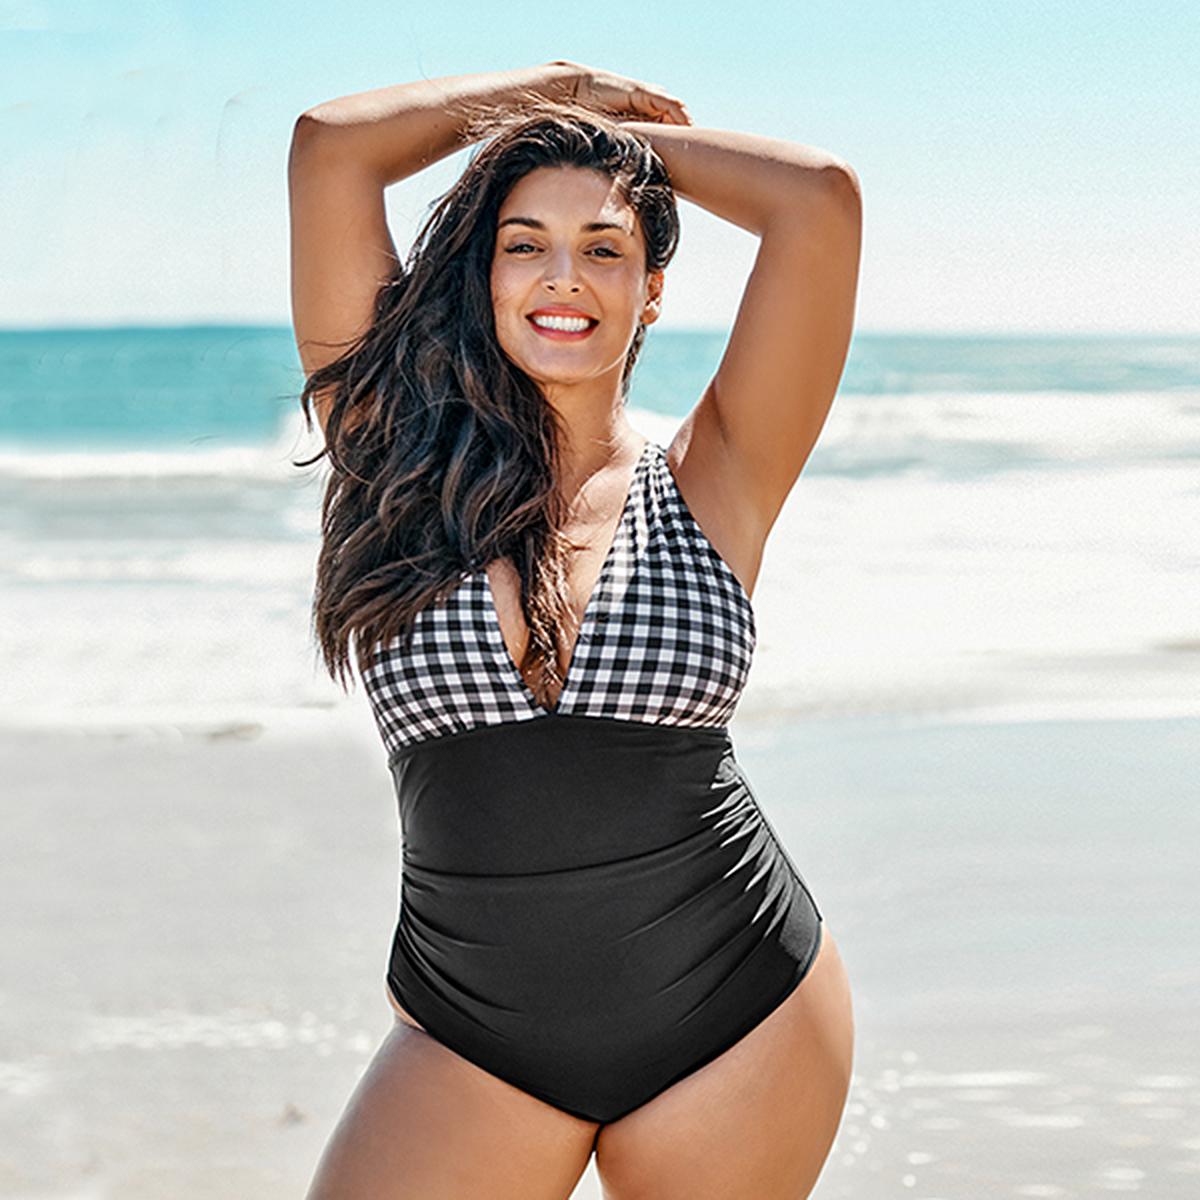 tummy-control-swimsuit-gingham